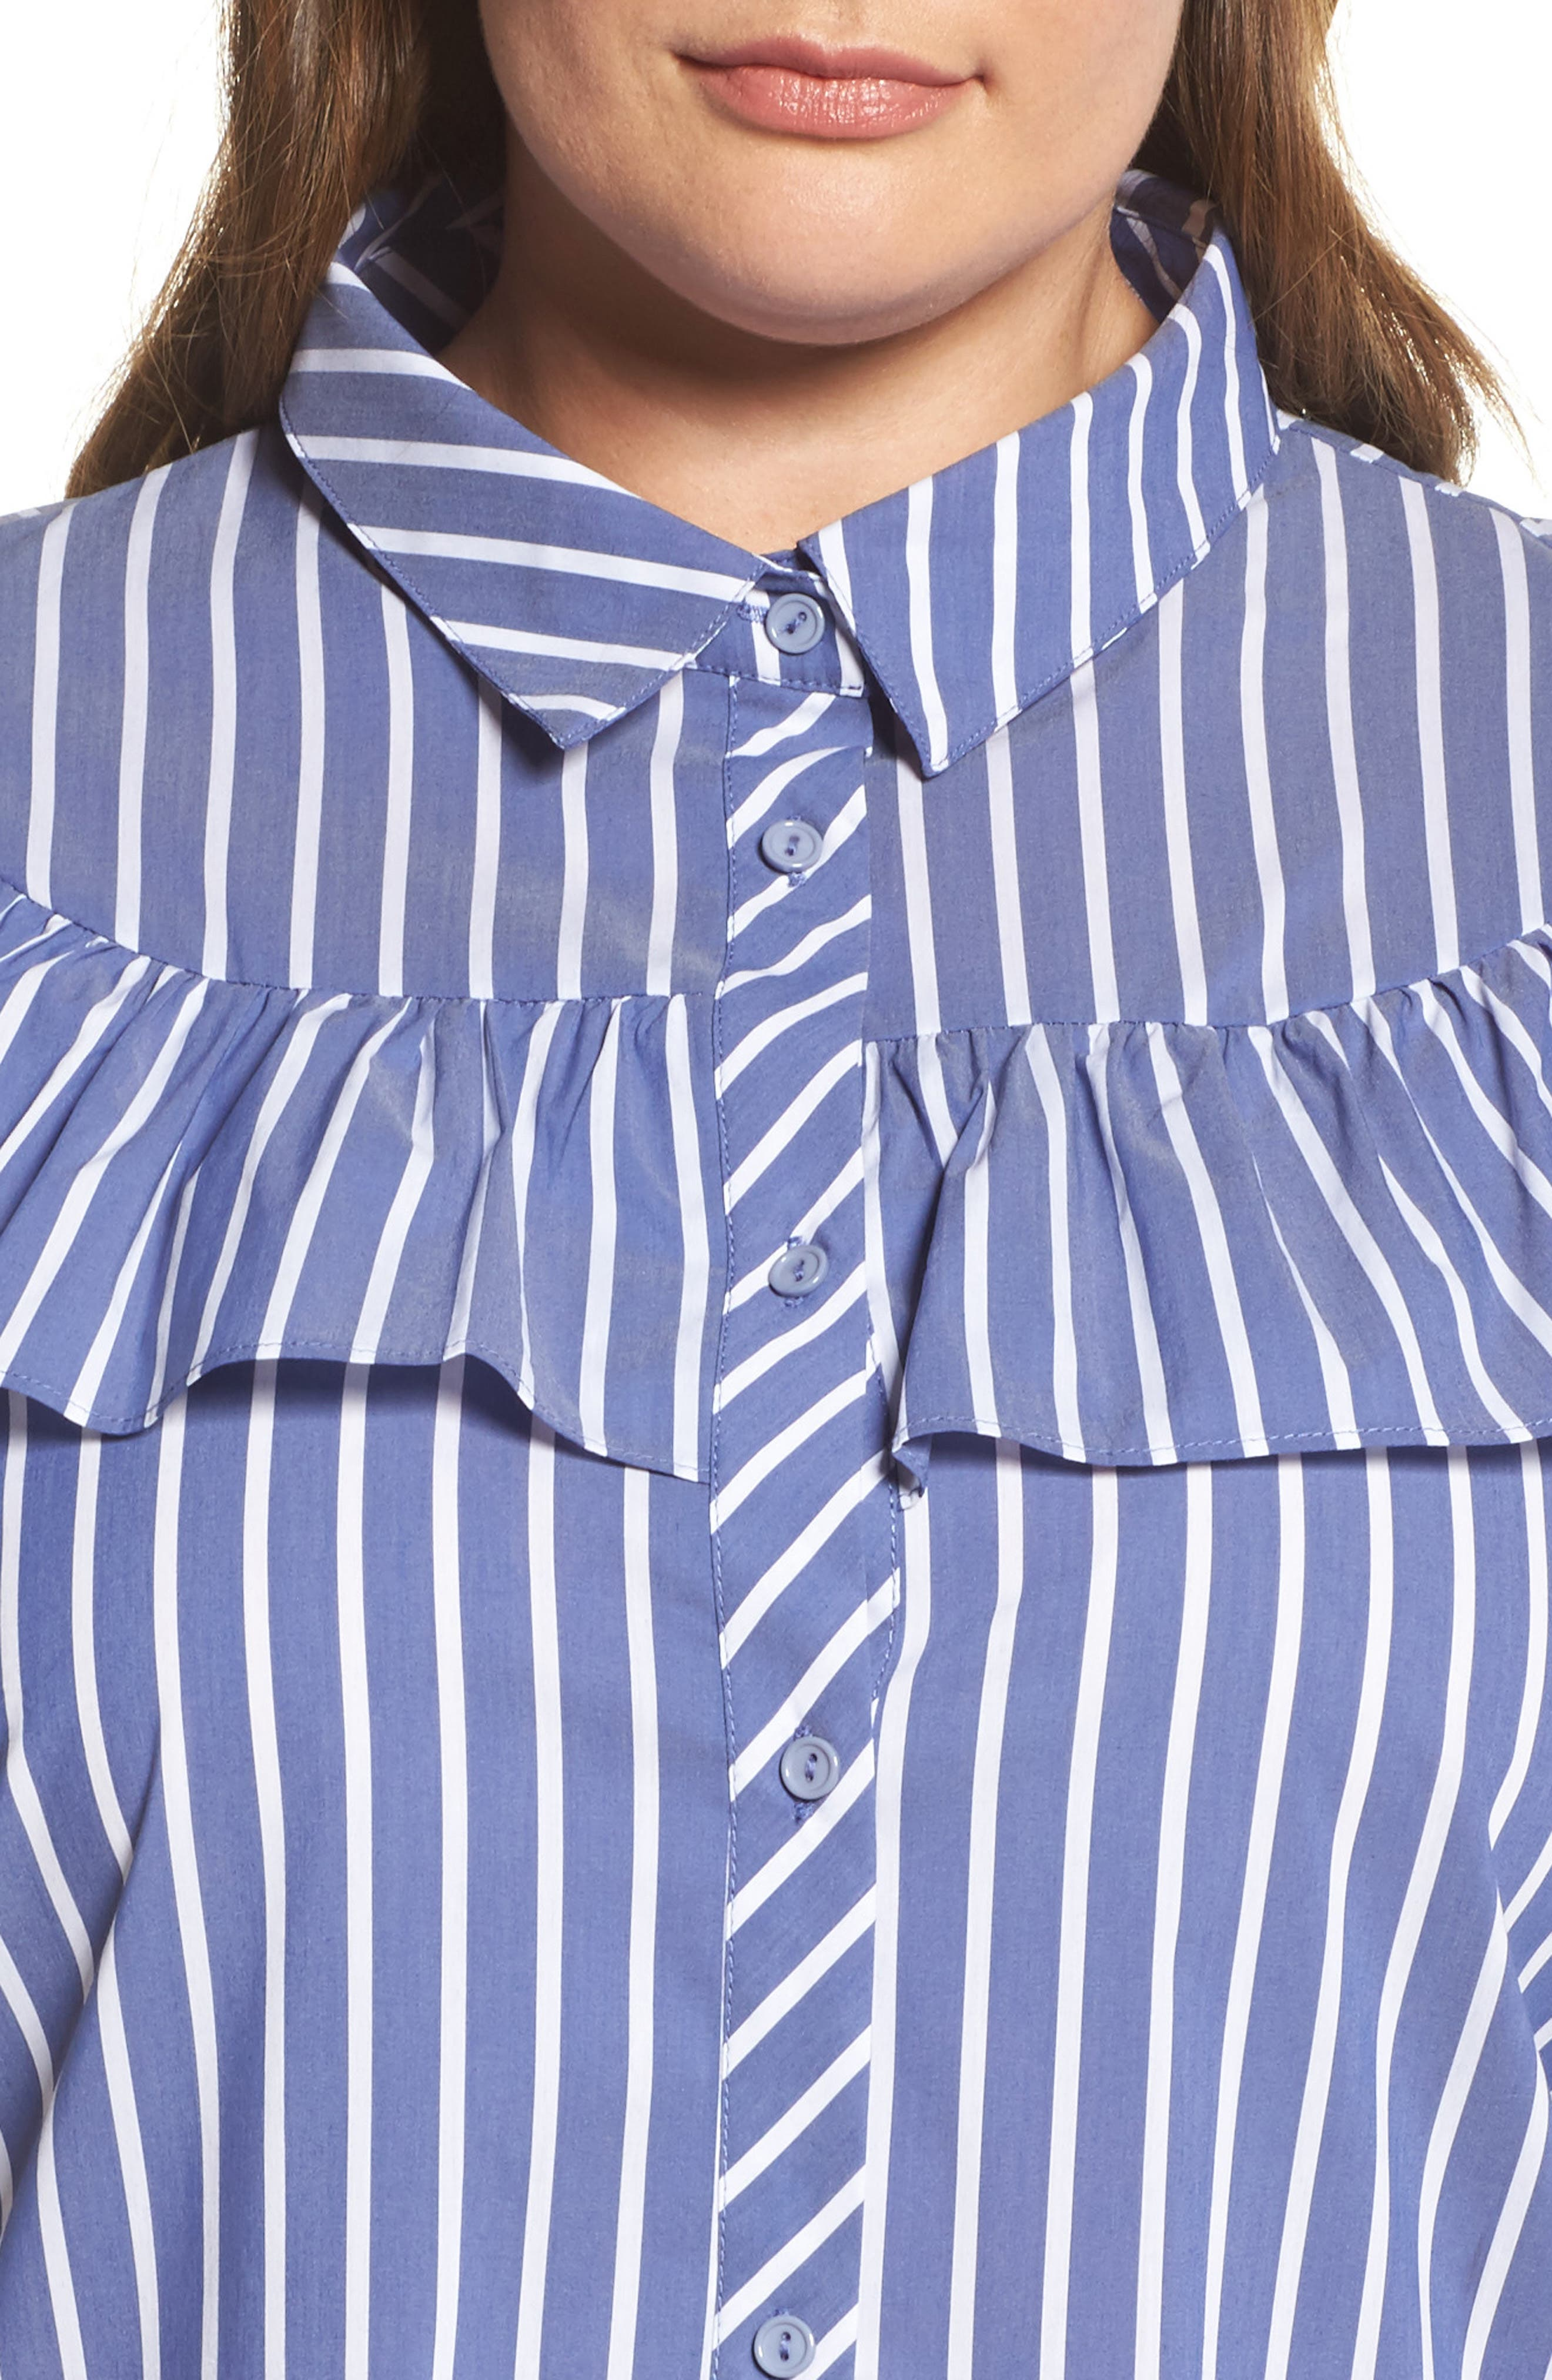 Ruffle Stripe Shirtdress,                             Alternate thumbnail 4, color,                             Blue White Stripe